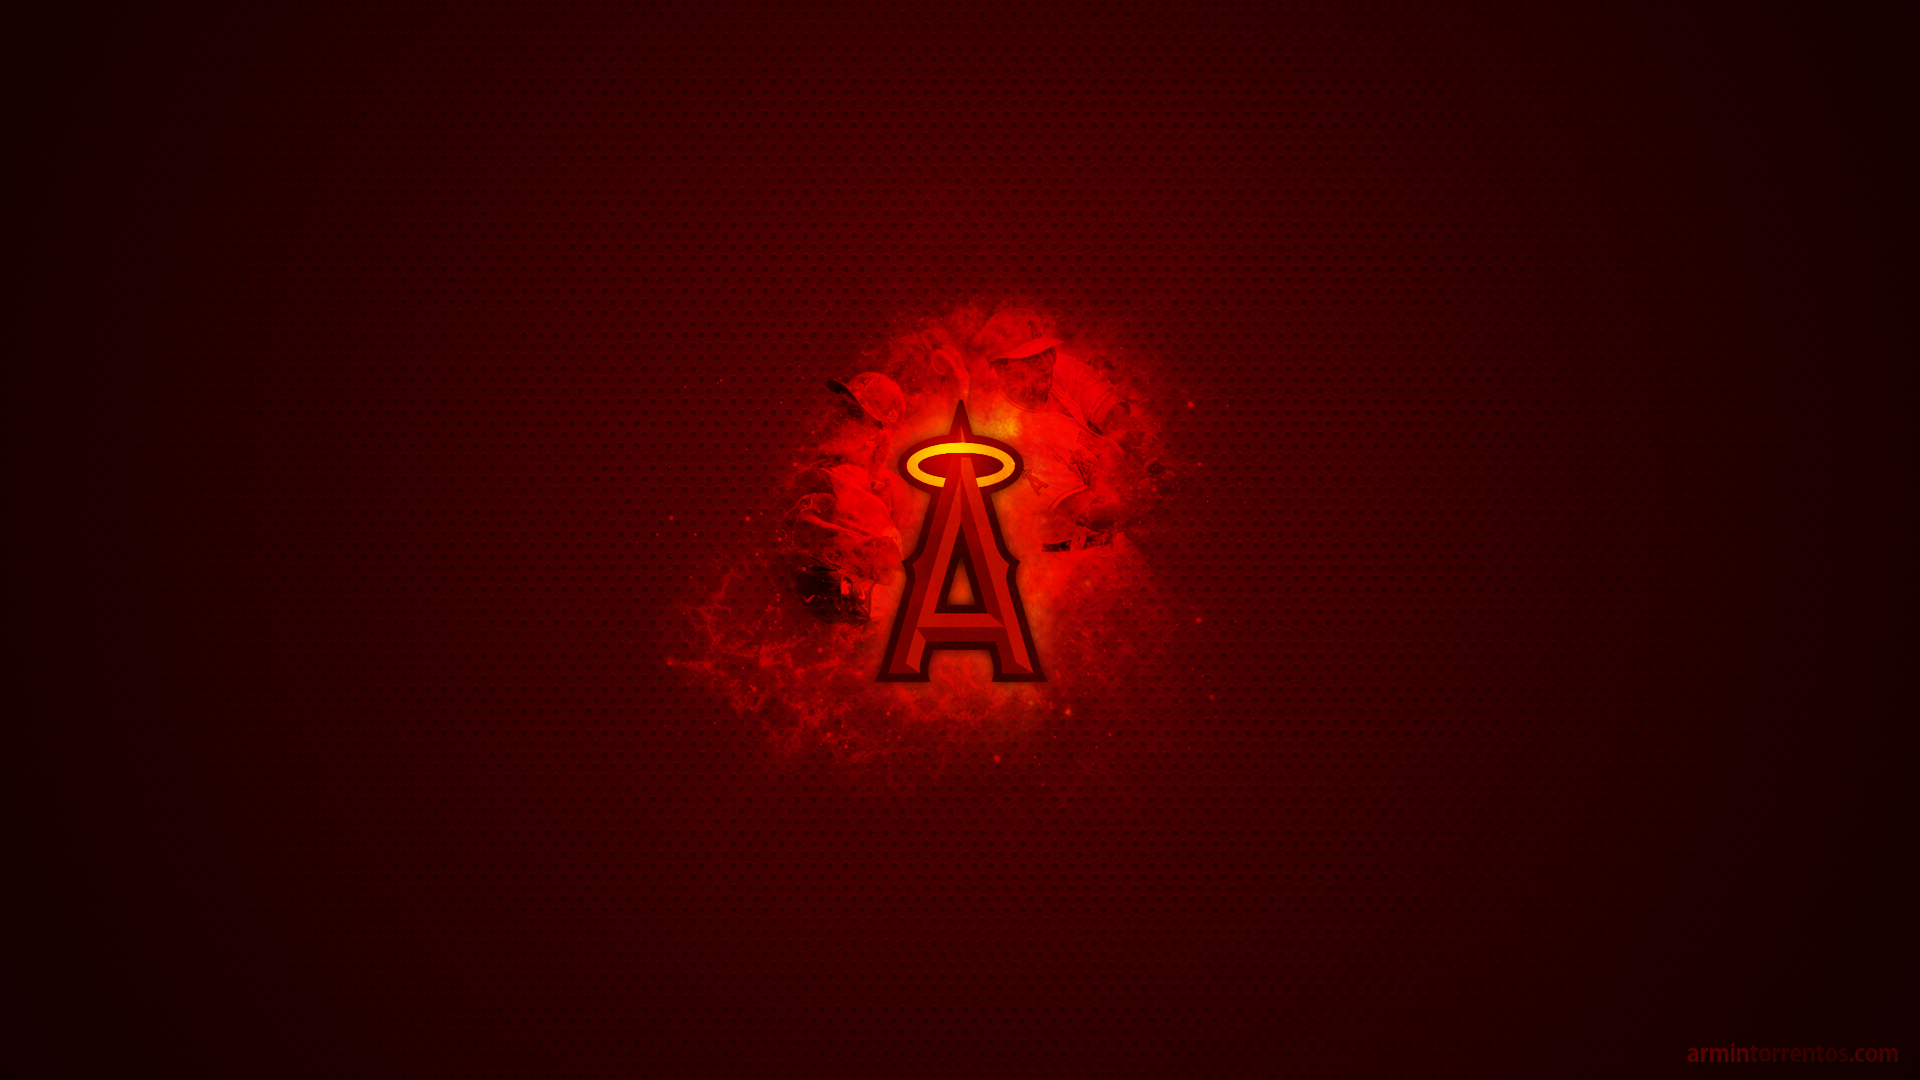 ANAHEIM ANGELS baseball mlb eh wallpaper 1920x1080 1920x1080